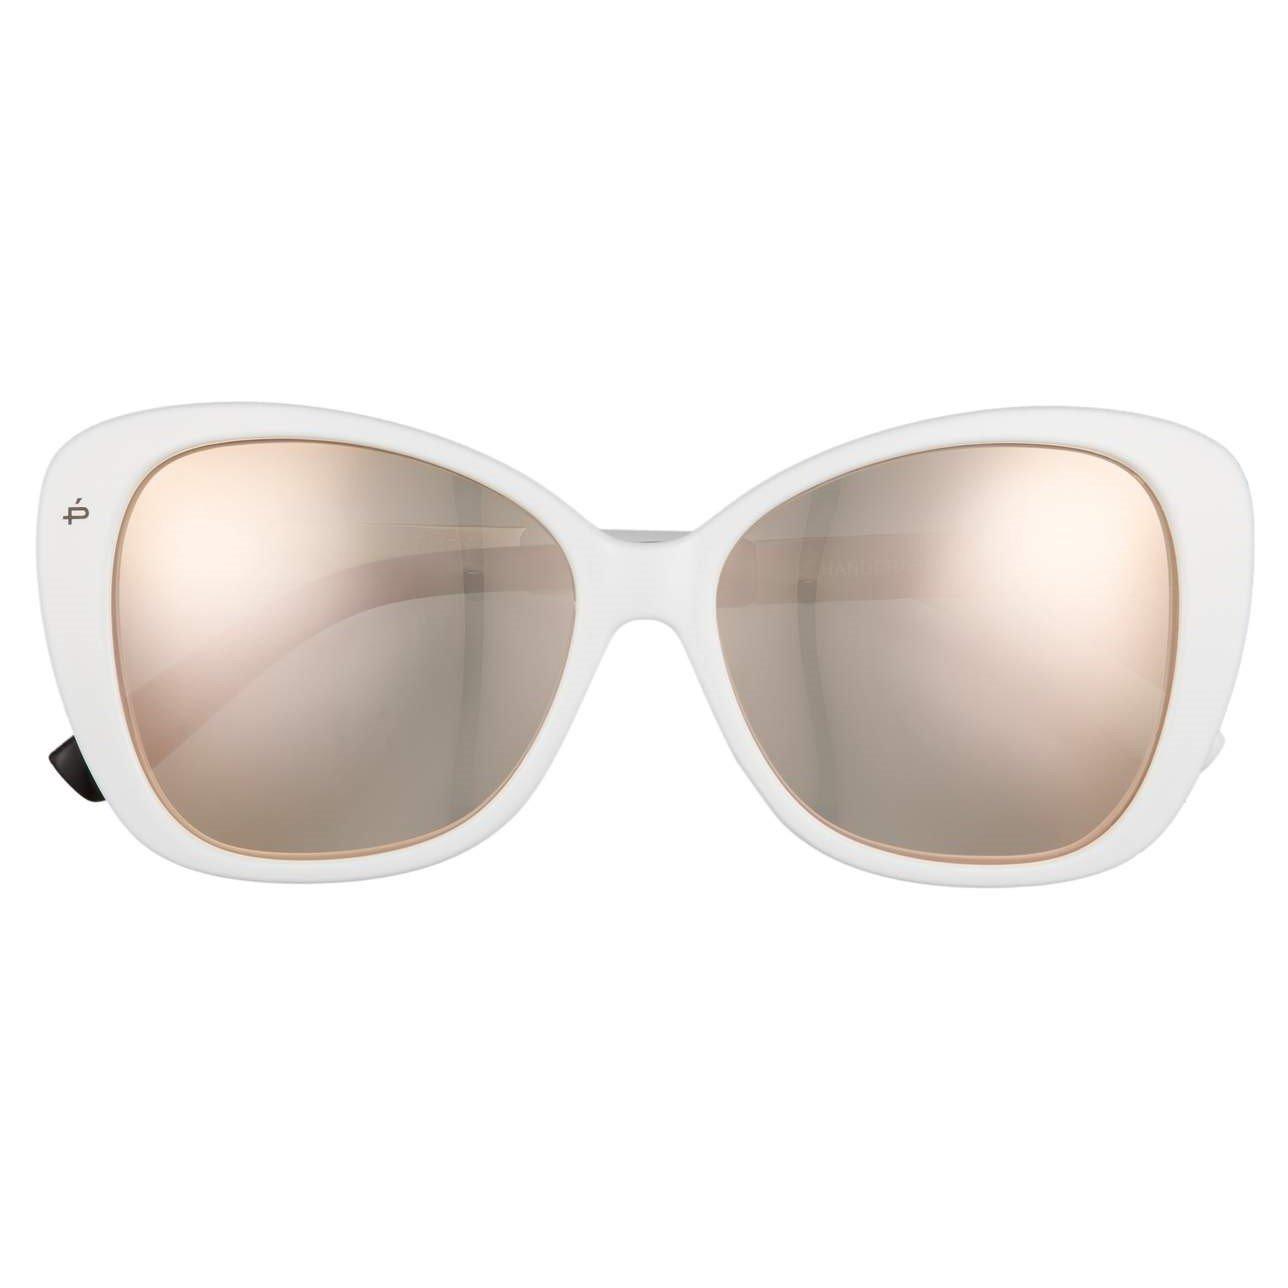 "f3996f19785e7 Amazon.com  PRIVÉ REVAUX ICON Collection ""The Jackie O."" Designer Polarized  Cat-Eye Sunglasses  Clothing"